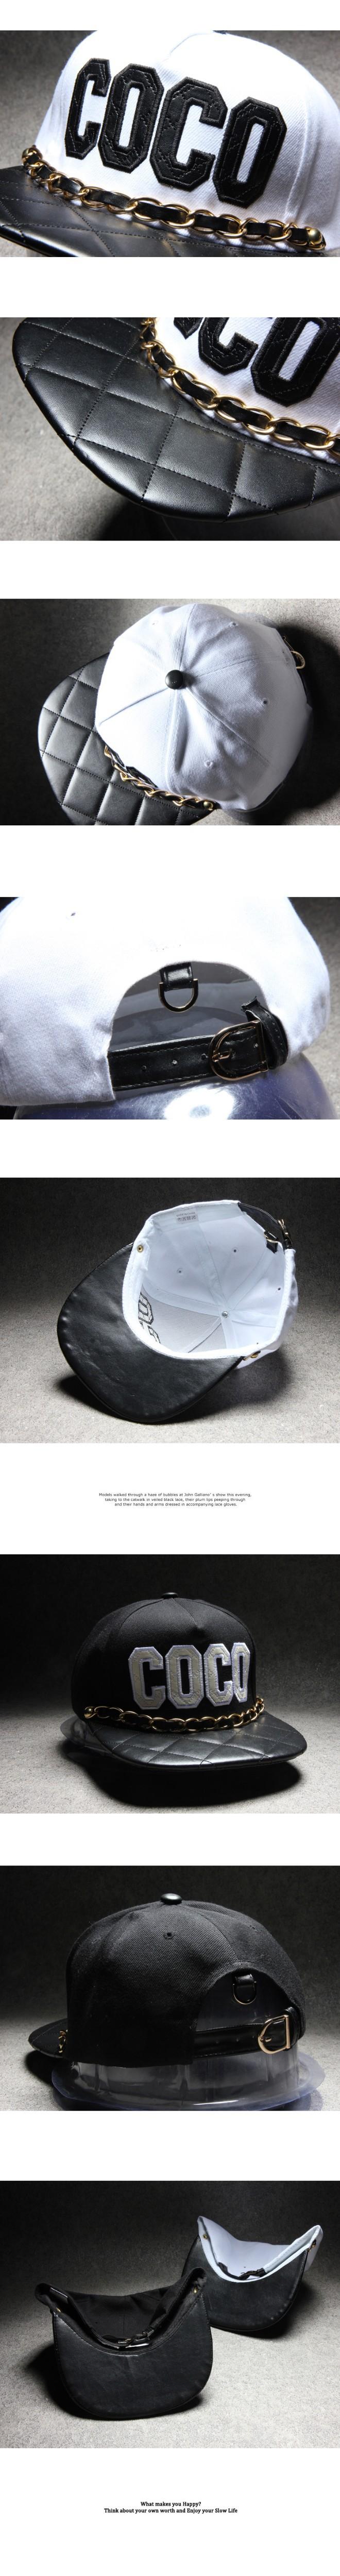 5eb226f8fca 2016 New Snapback Chipping Irregular Leather Couple Black White ...